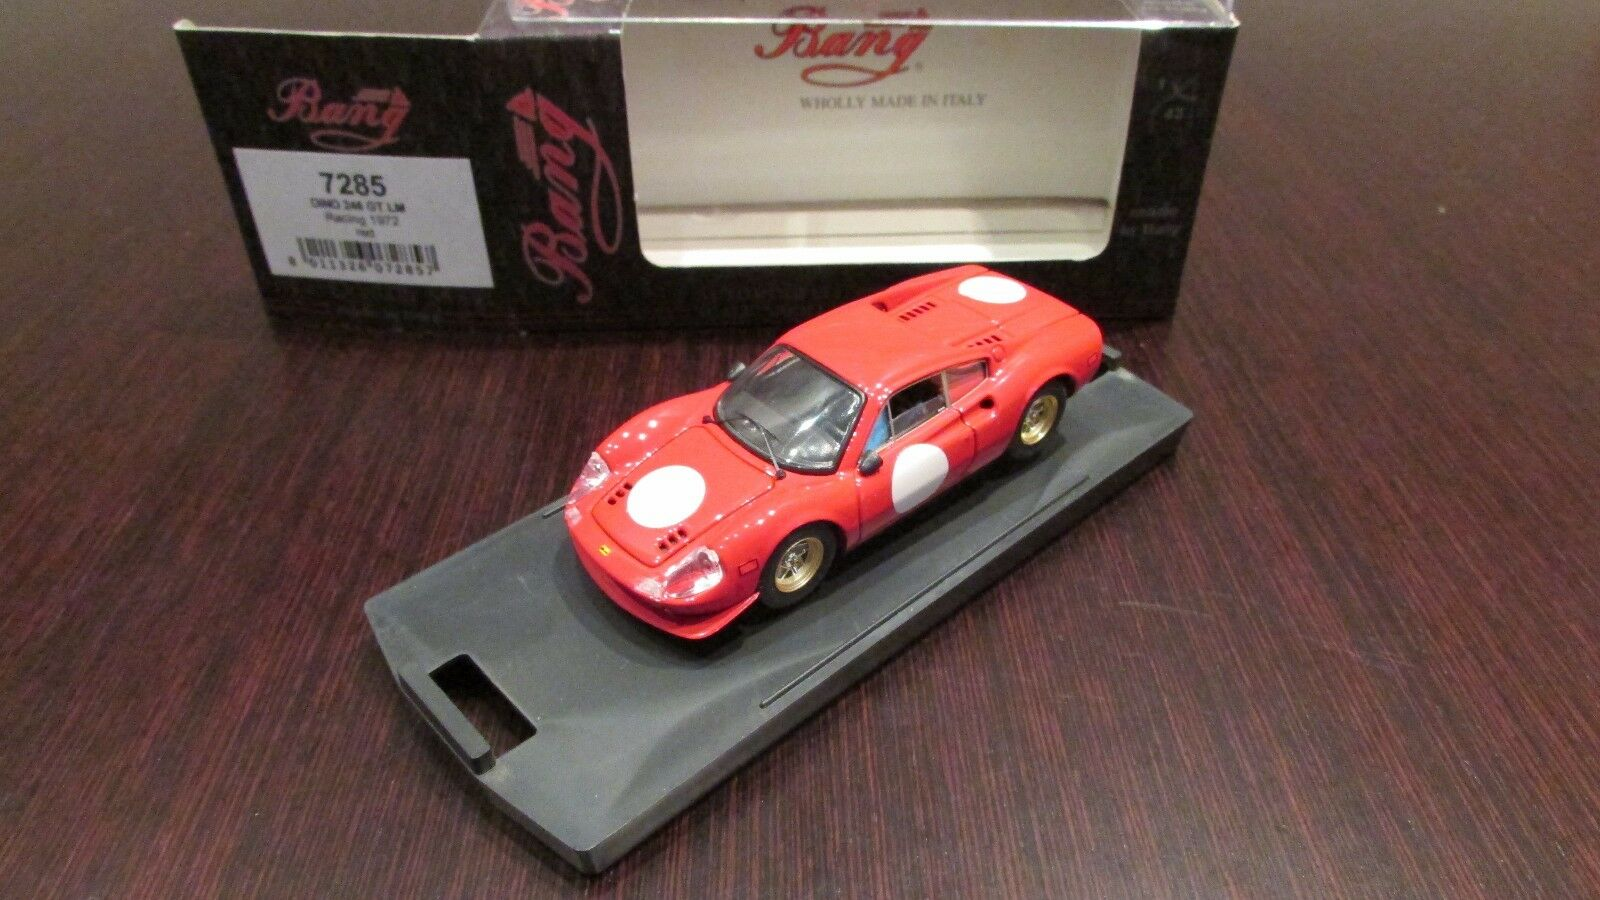 FERRARI Dino 246 GT LM LM LM N.A.R.T. press version 1 43 BANG 94c5fa